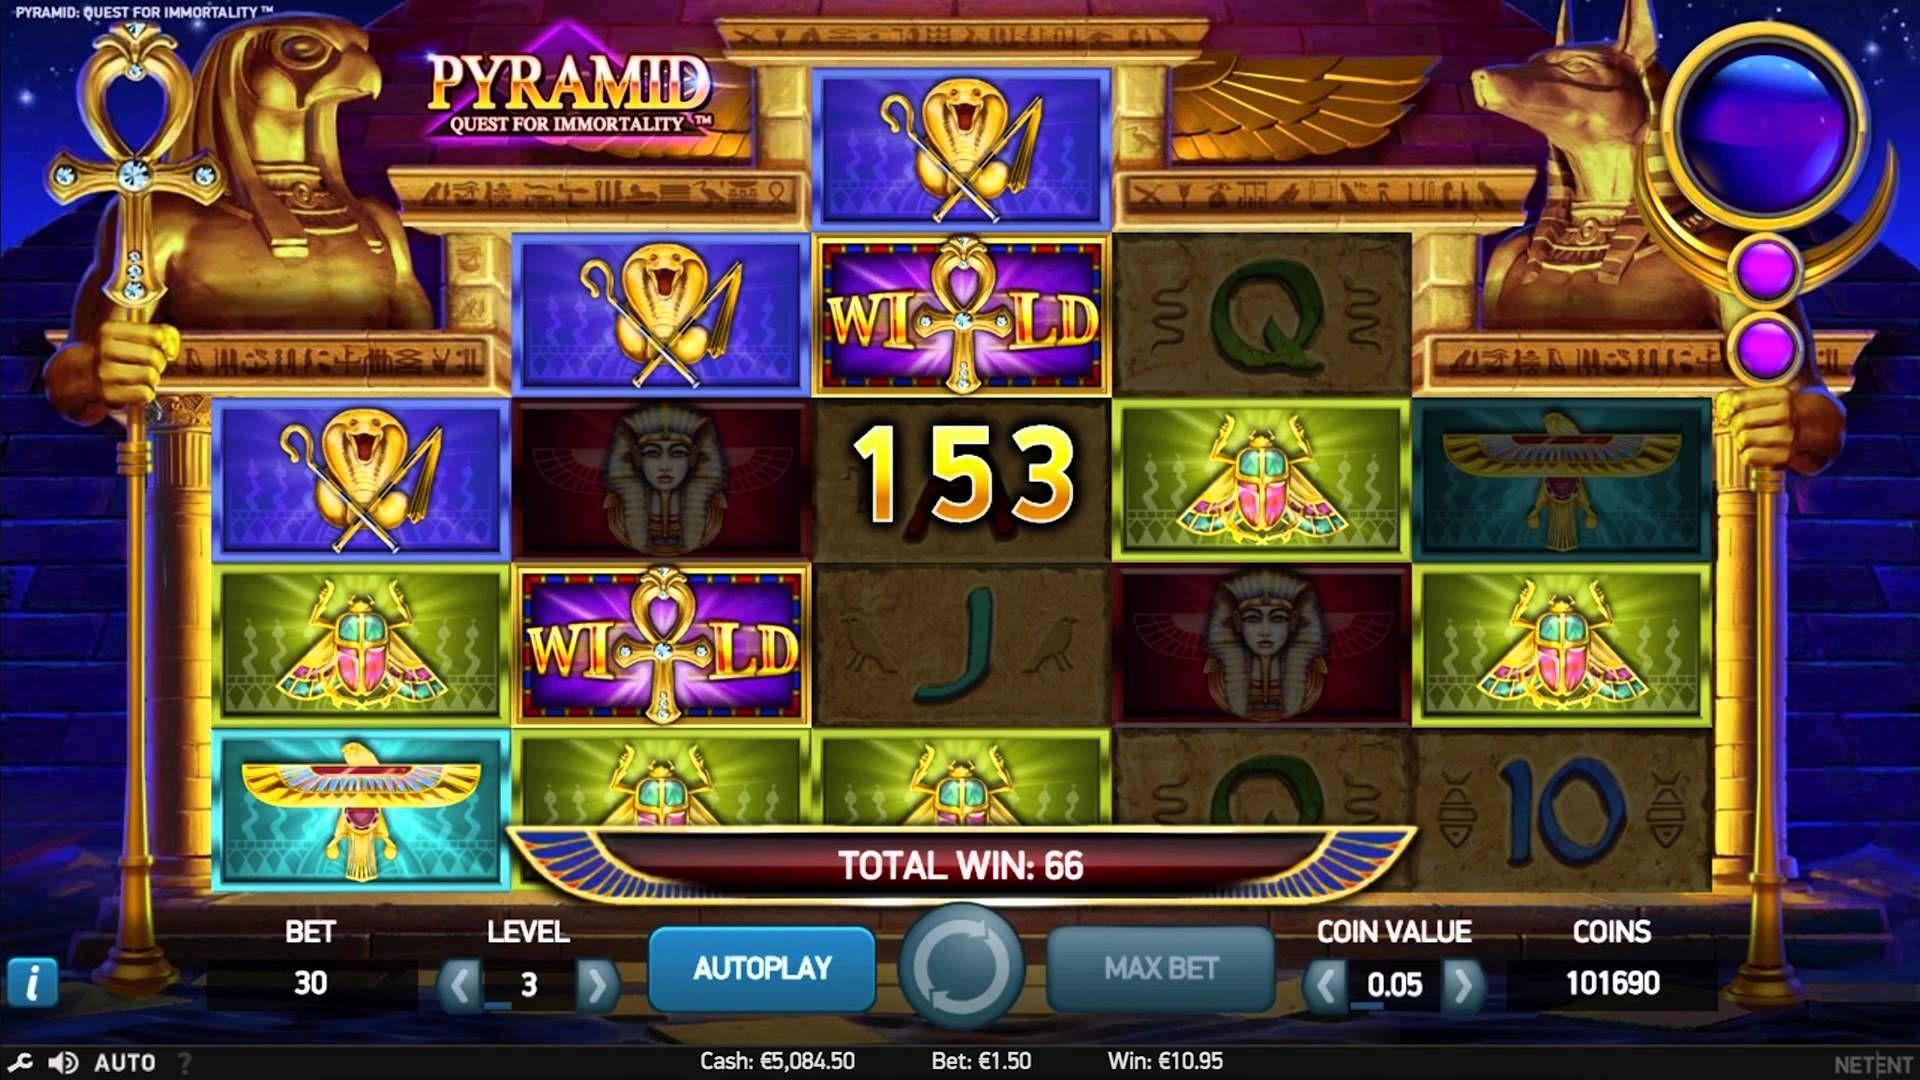 игровой автомат pyramid quest for immortality